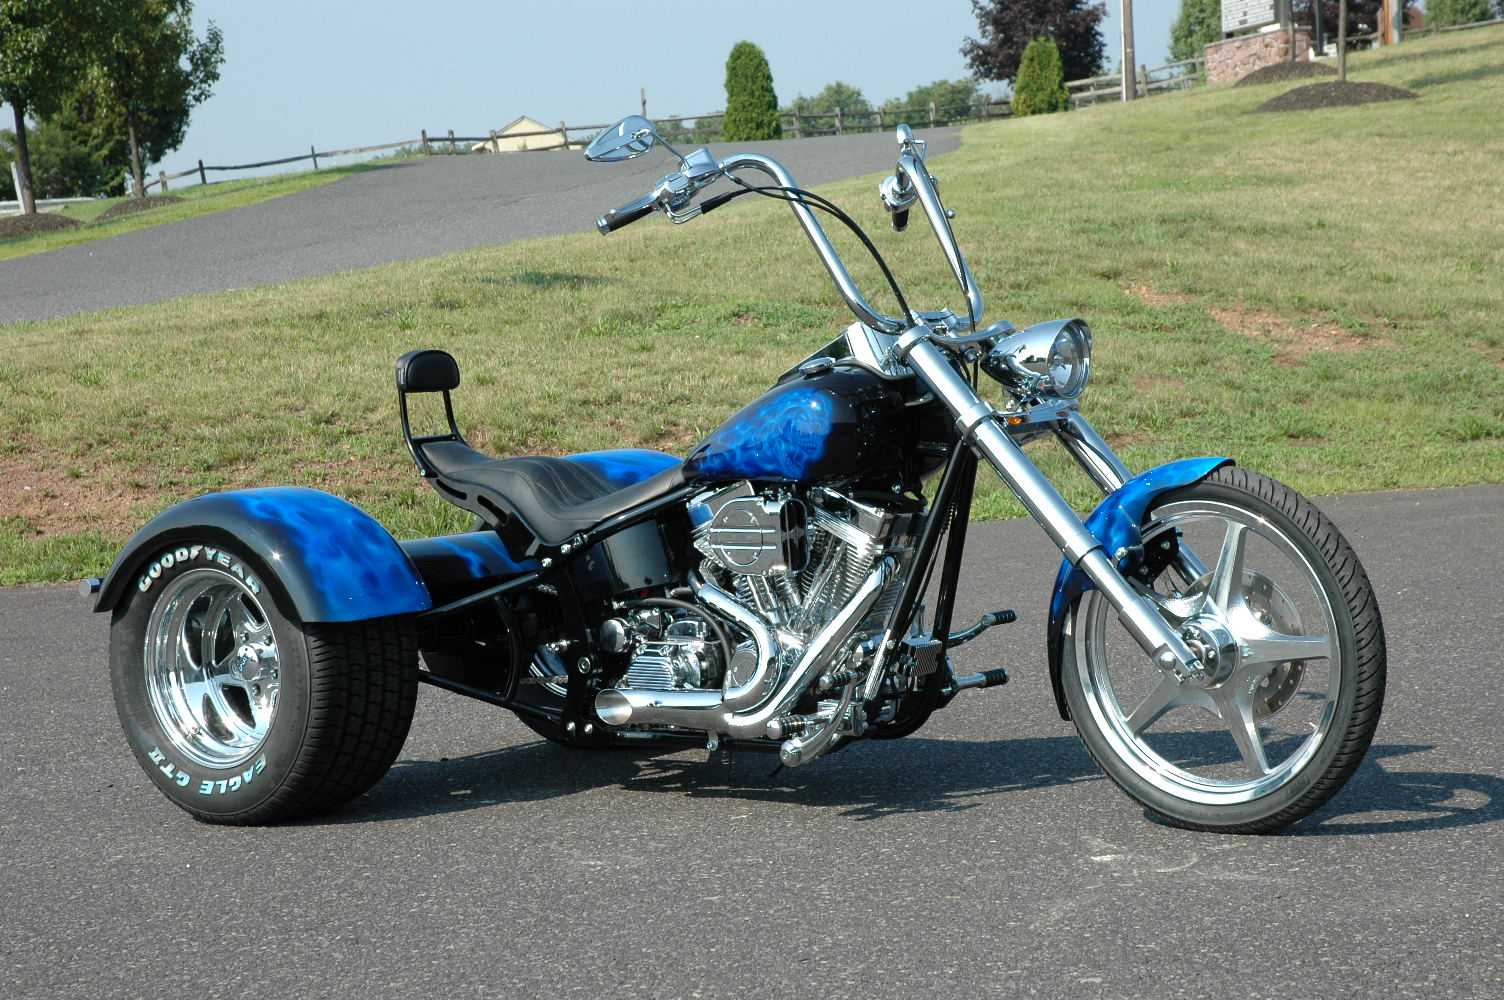 Harley Davidson Trikes on